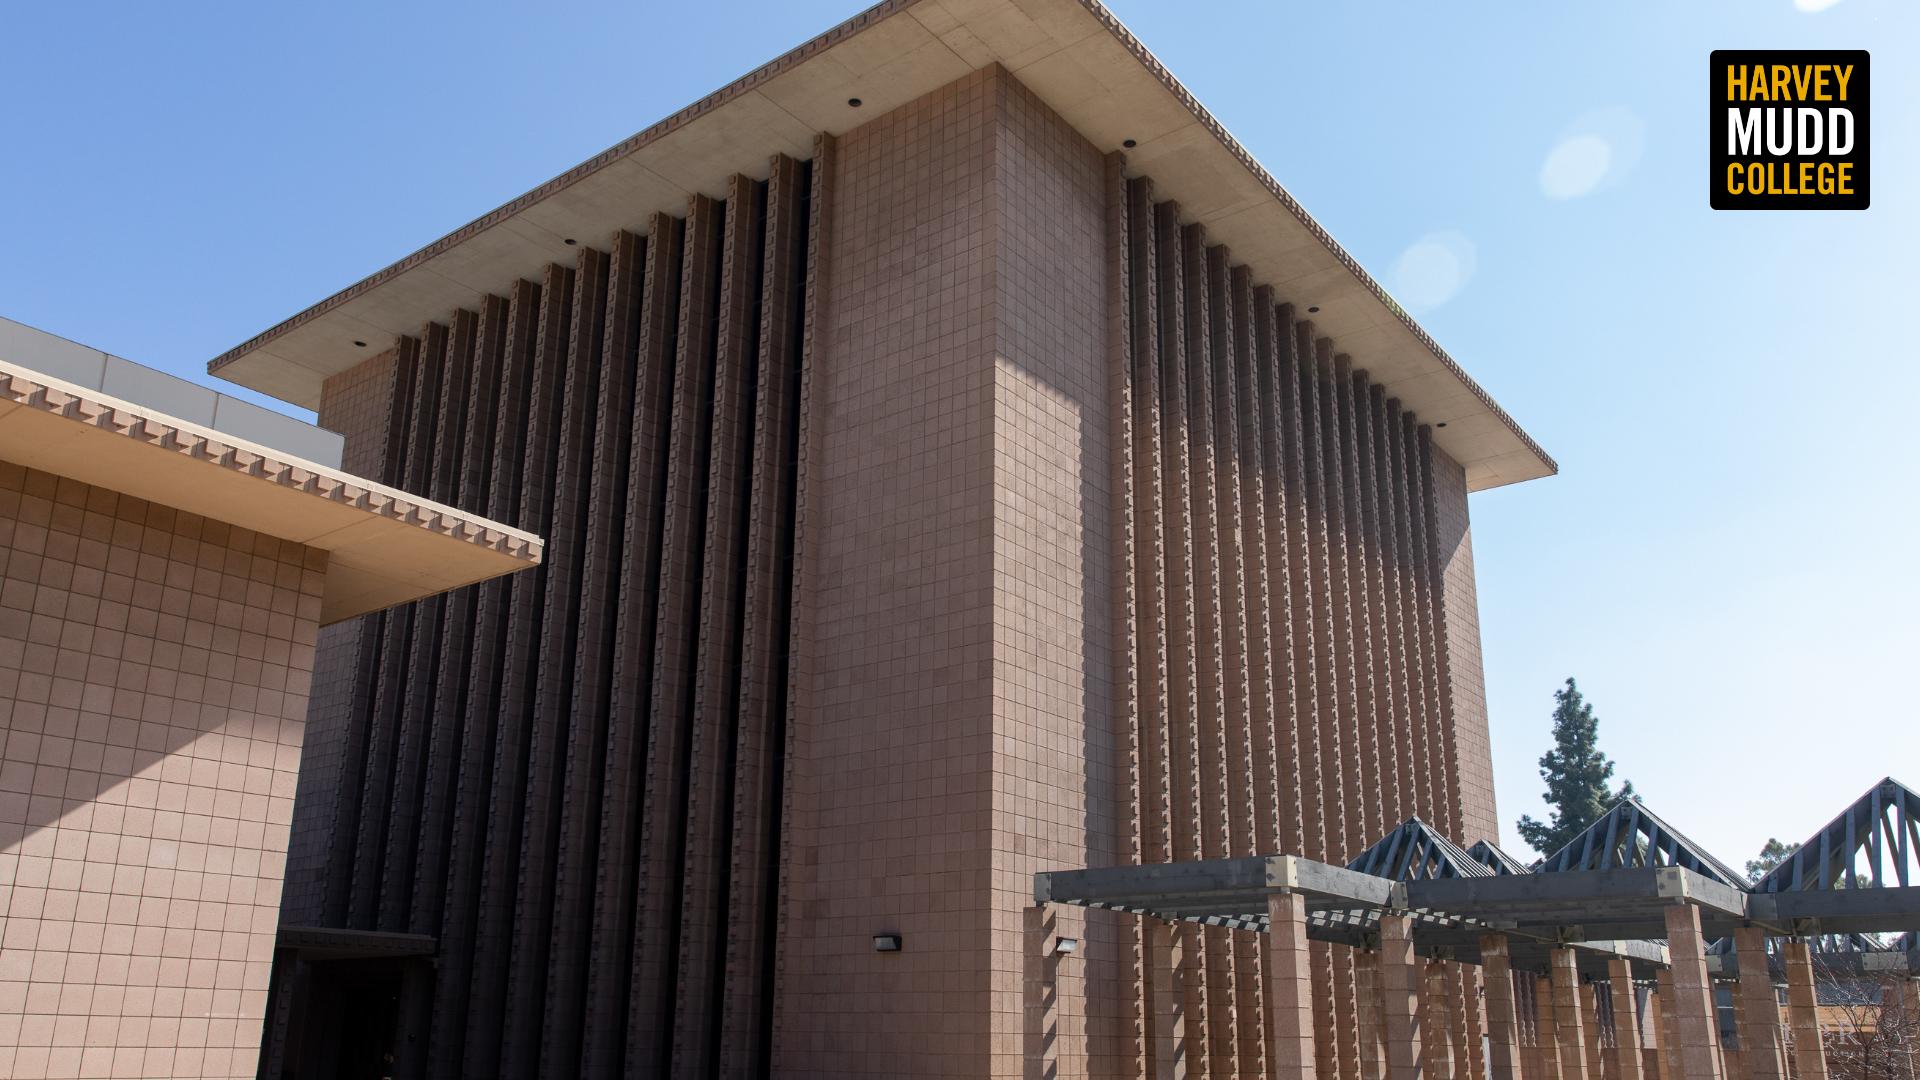 Sprague Center, Harvey Mudd College